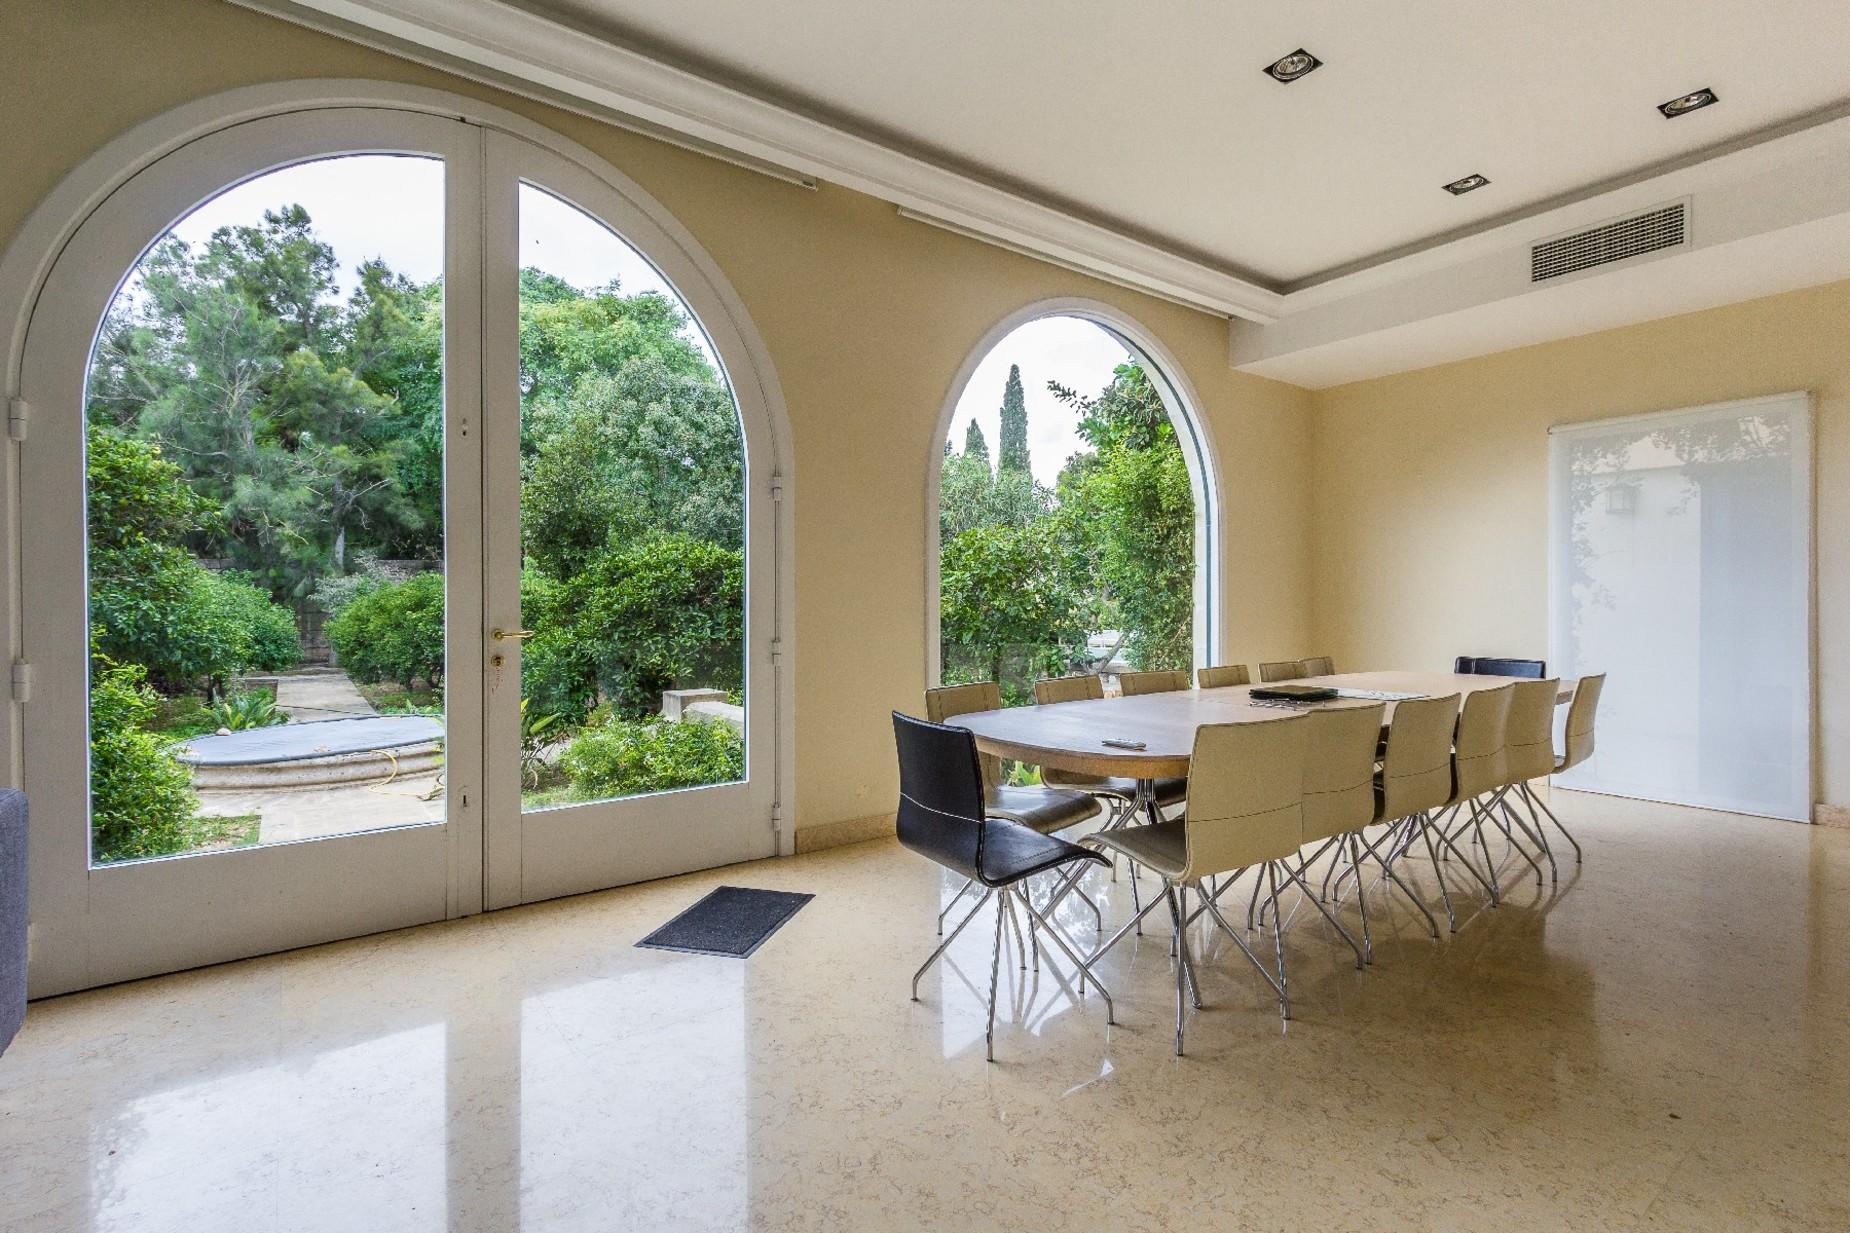 6 bed Palazzo For Rent in Balzan, Balzan - thumb 2